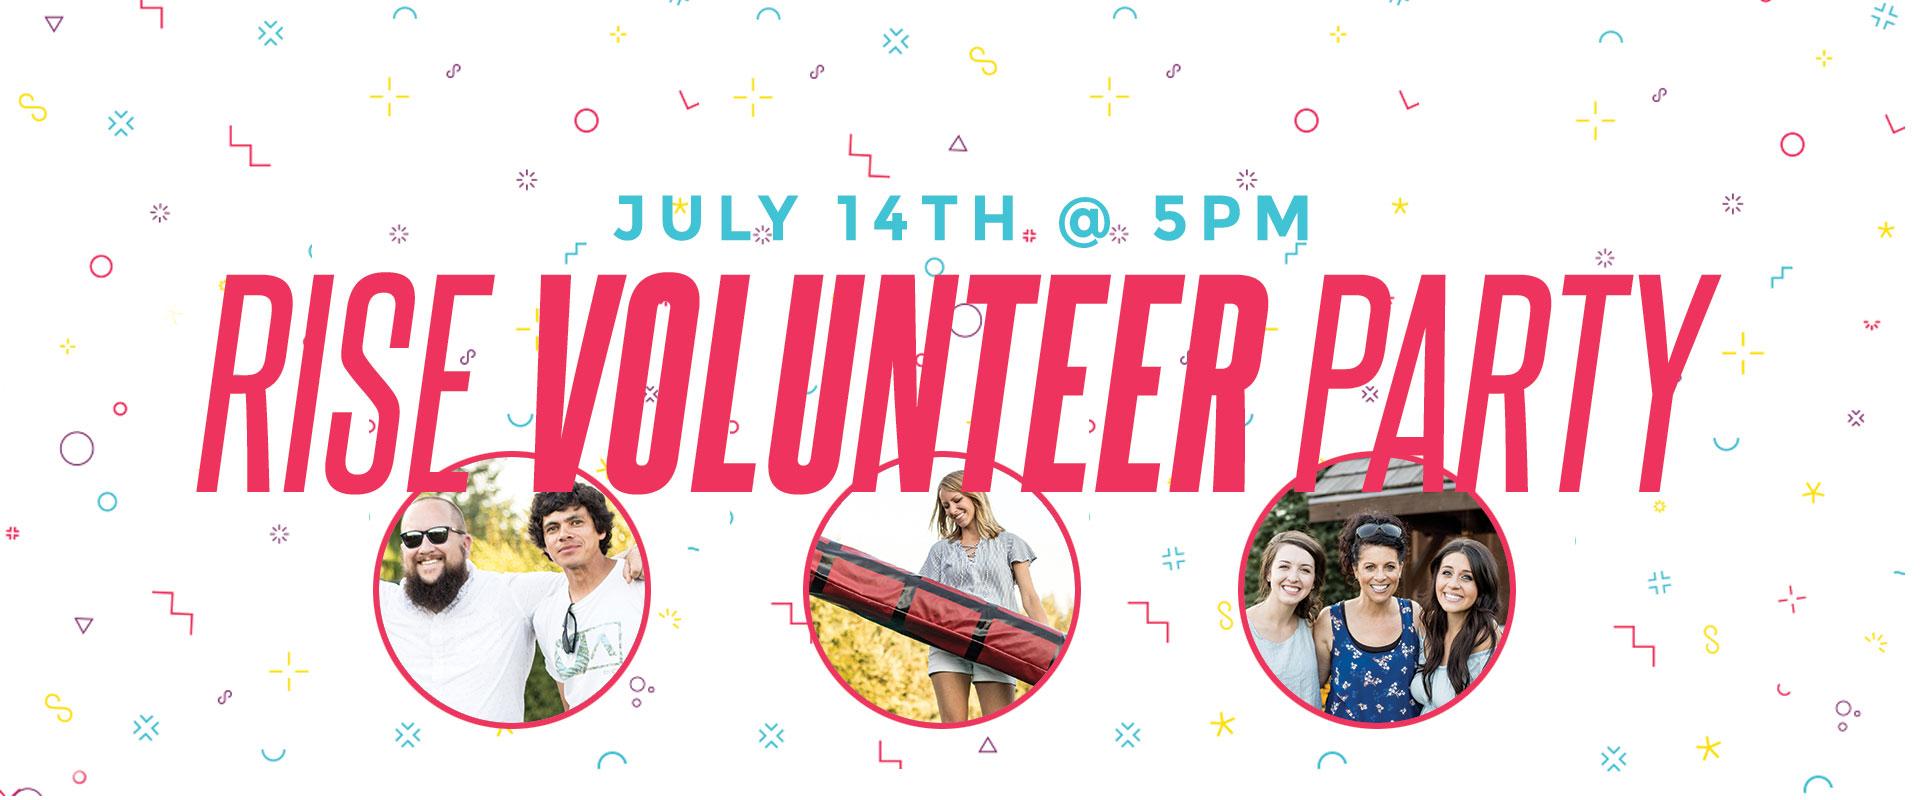 Volunteer party 5pm